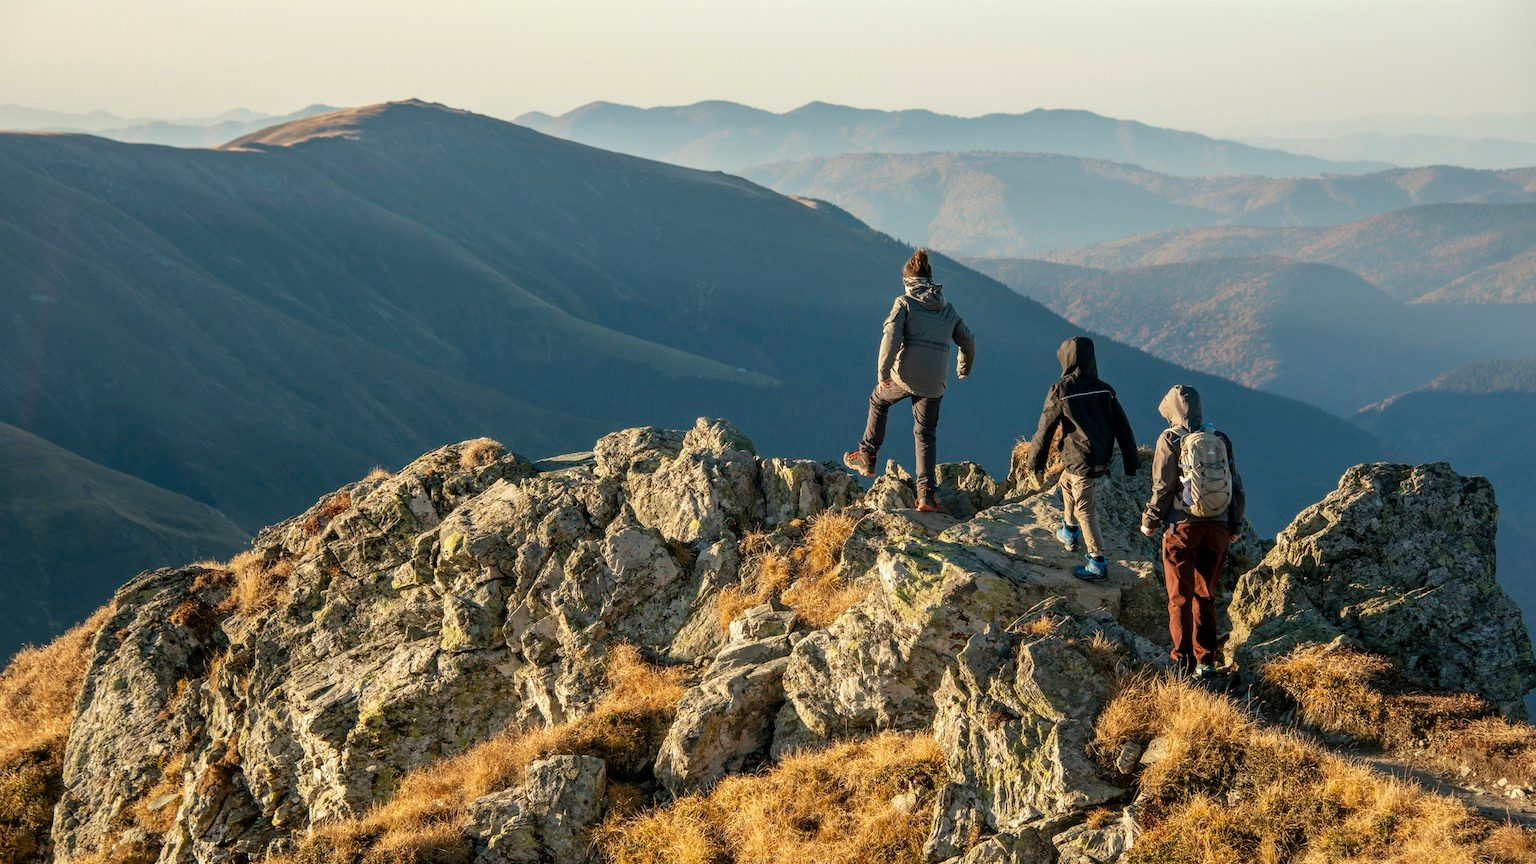 Vânătarea lui Buteanu, at 2,507 metres, is the eighth-highest peak in Romania and the fifth-highest peak from Făgăraș Mountains